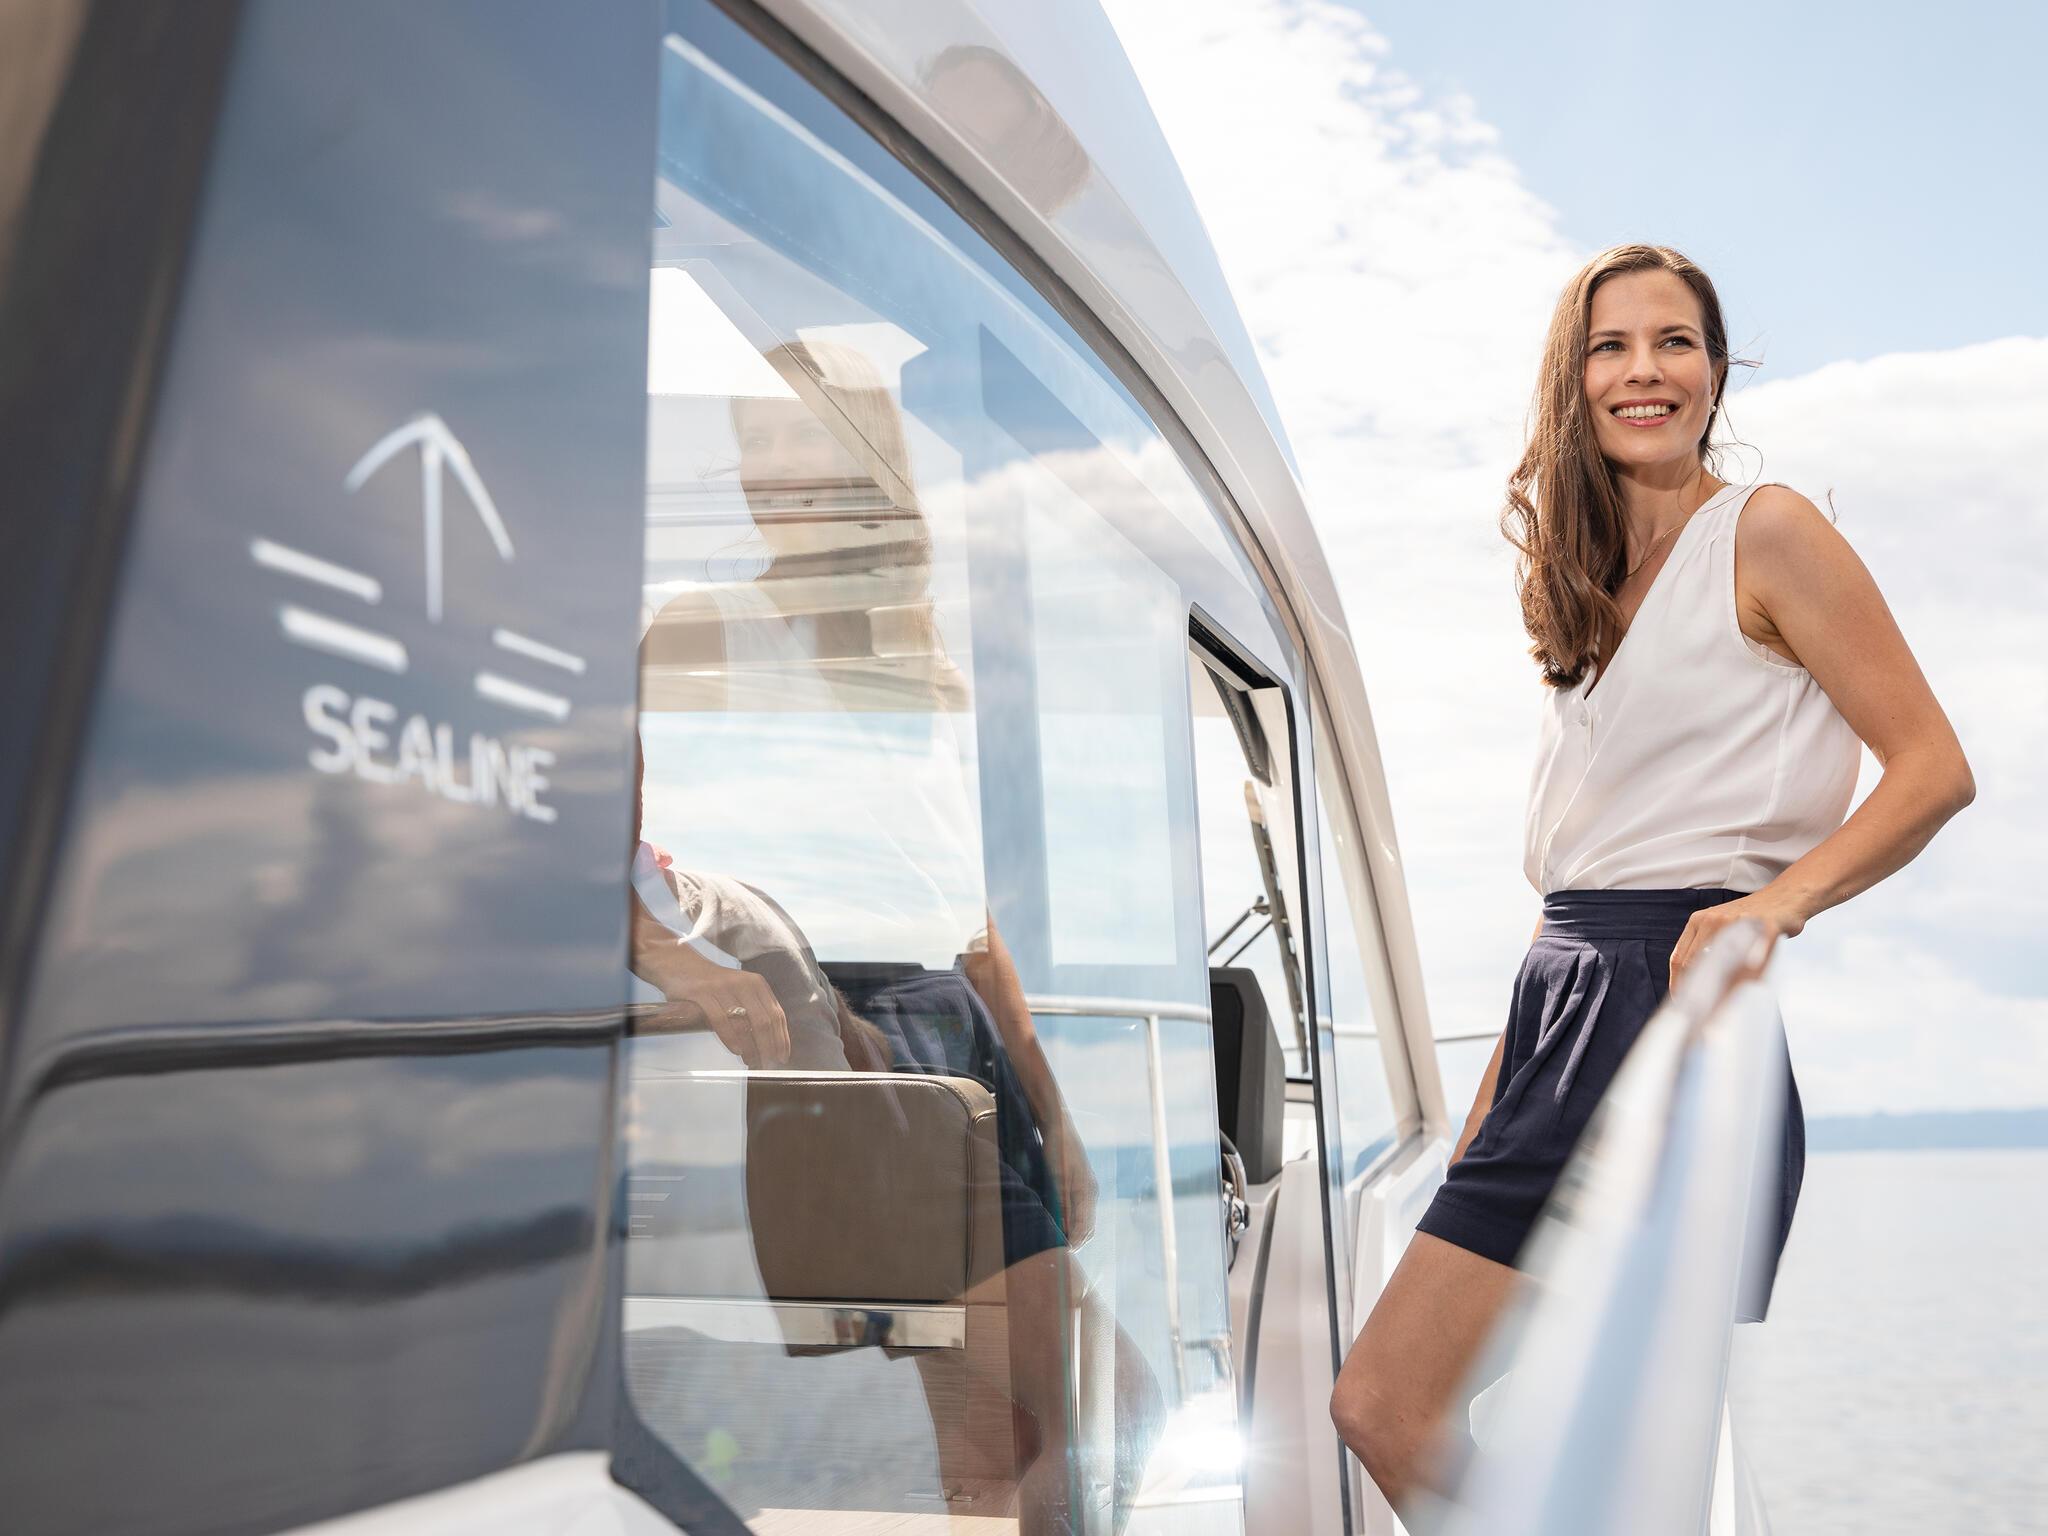 Sealine_C390_Interior_View_26_people_deck_016